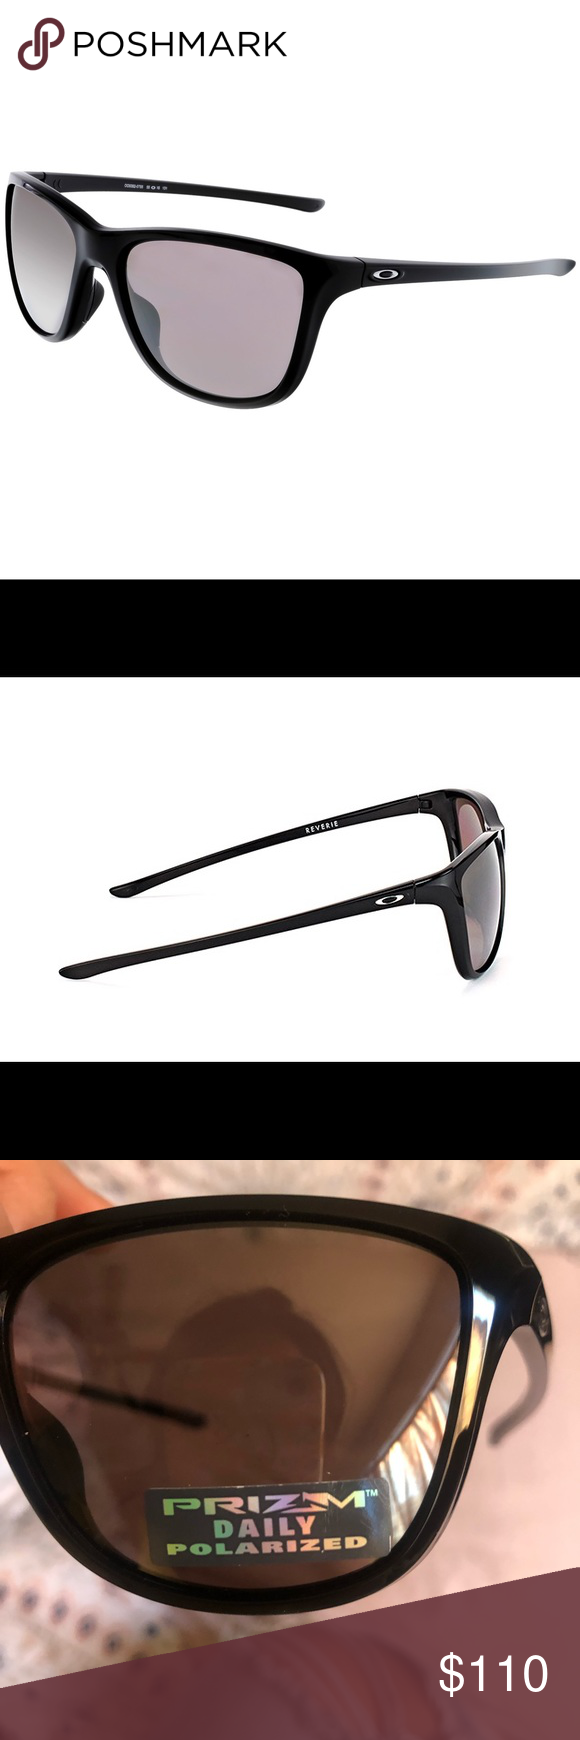 dd5808ac21cef Oakley Reverie Polarized Sunglasses Brand new Oakley Reverie sunglasses.  Polarized